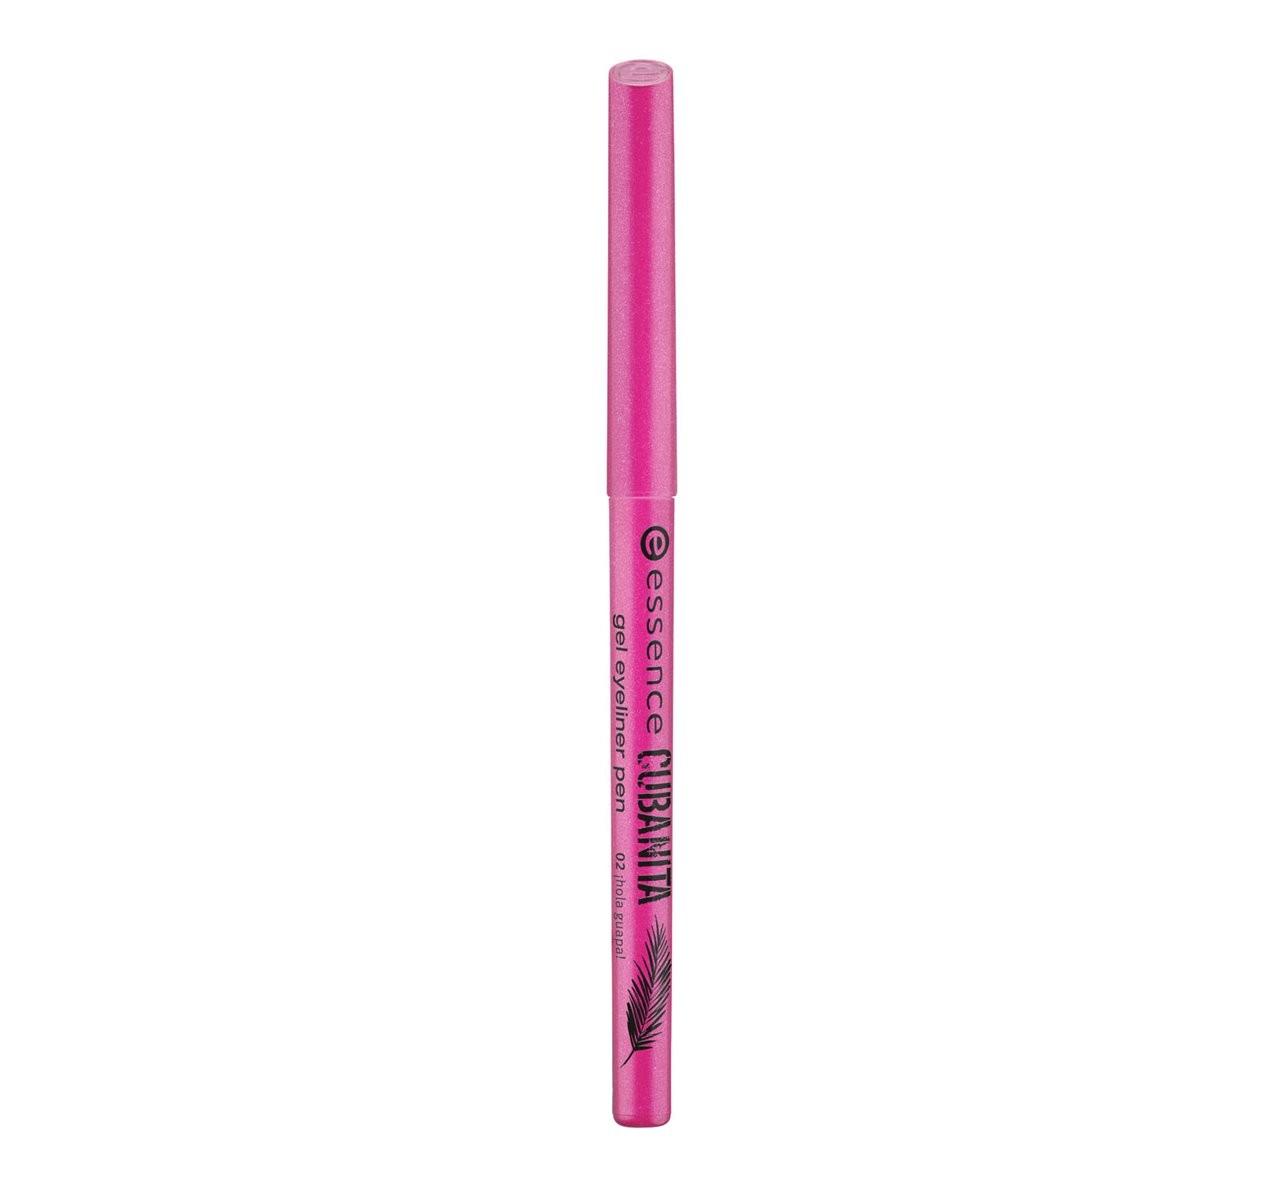 Essence Cubanita Gel Eyeliner Pen 02 Hola Guapa Beauty Hicartcom